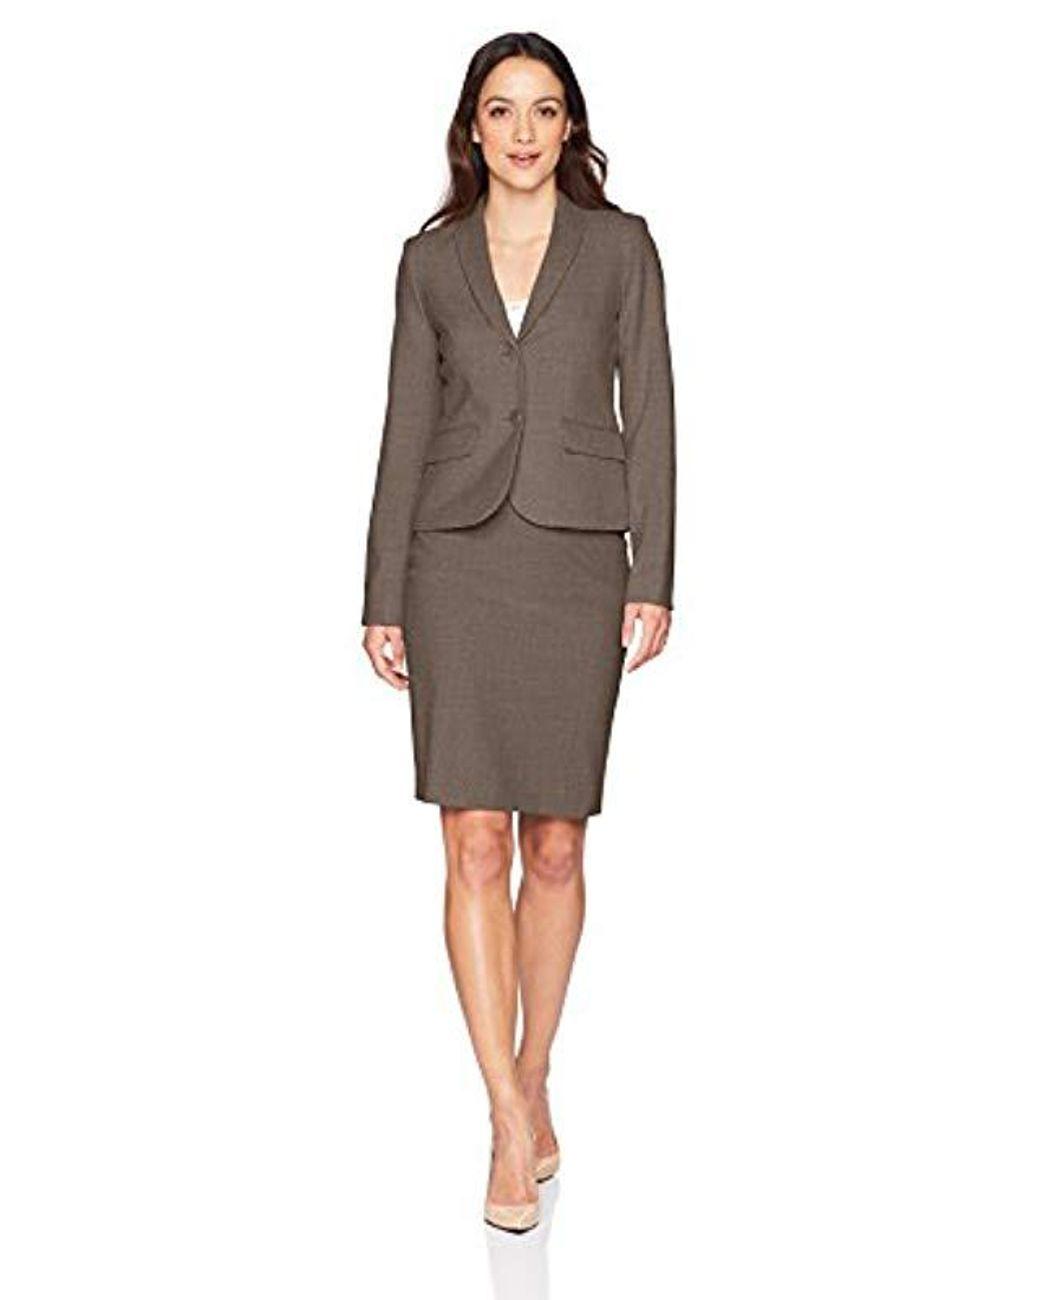 070658537d Calvin Klein Petite Lux Straight Skirt in Brown - Save 22% - Lyst